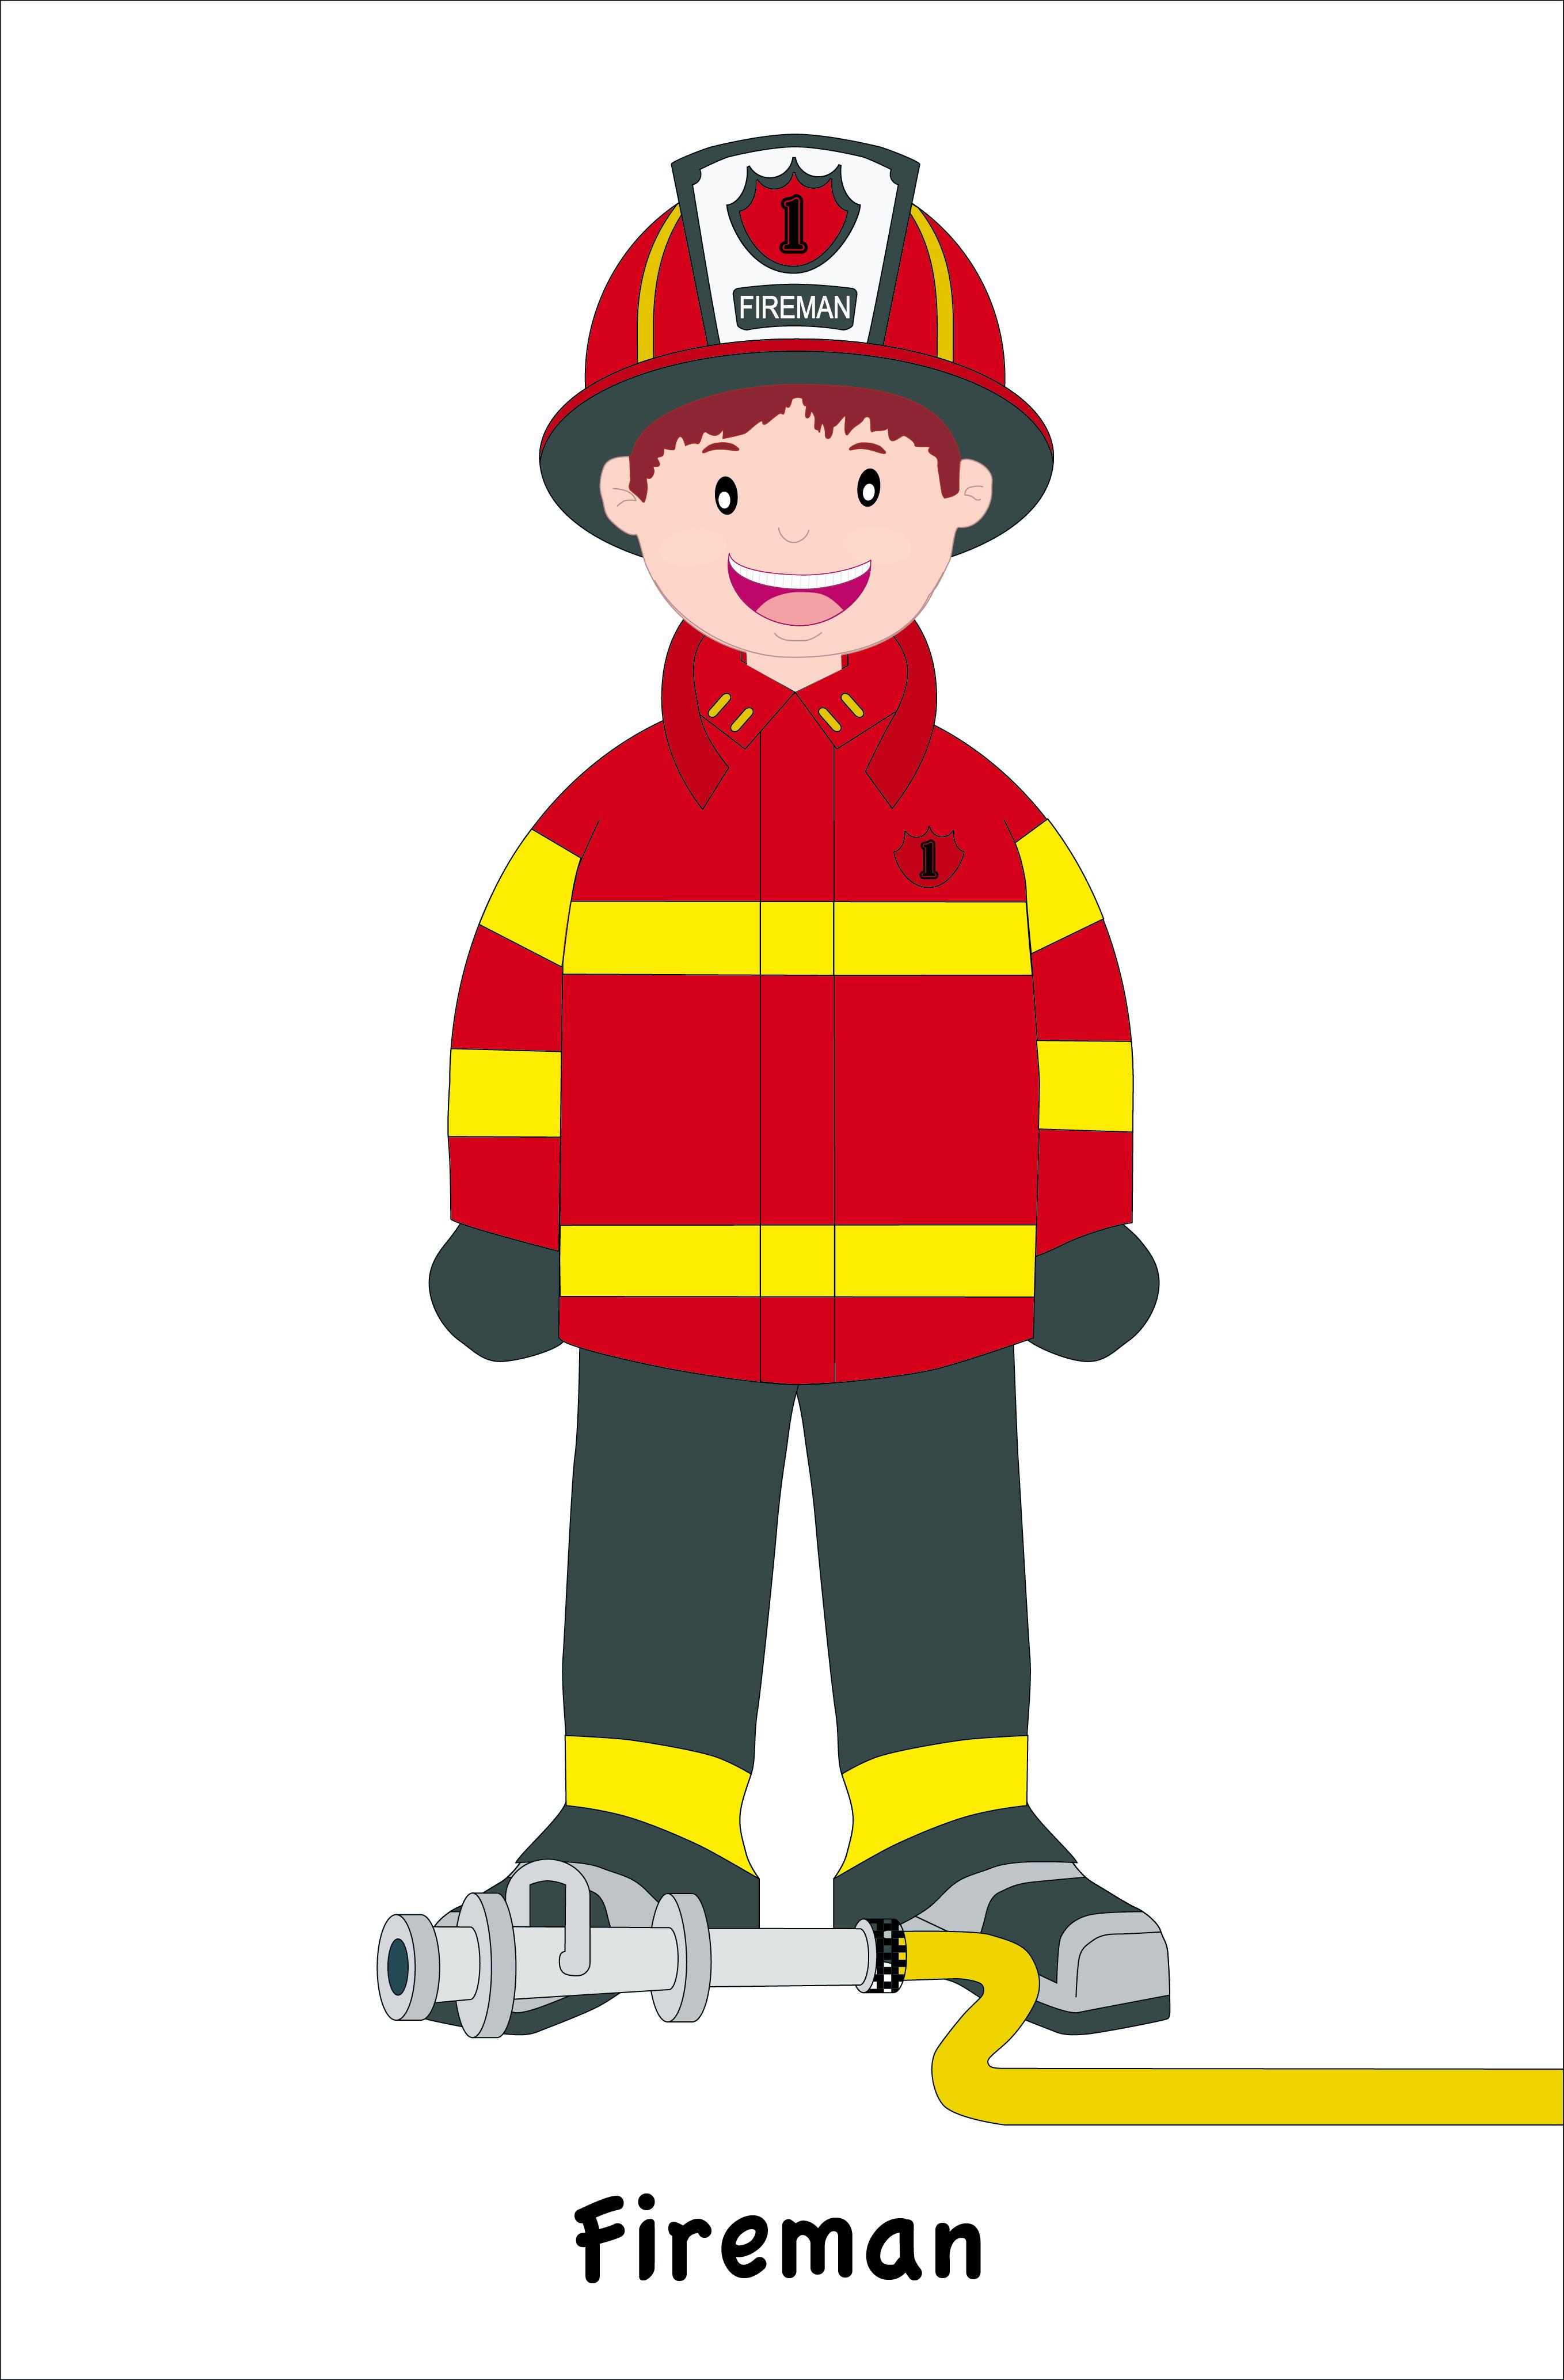 clipart fireman - photo #24